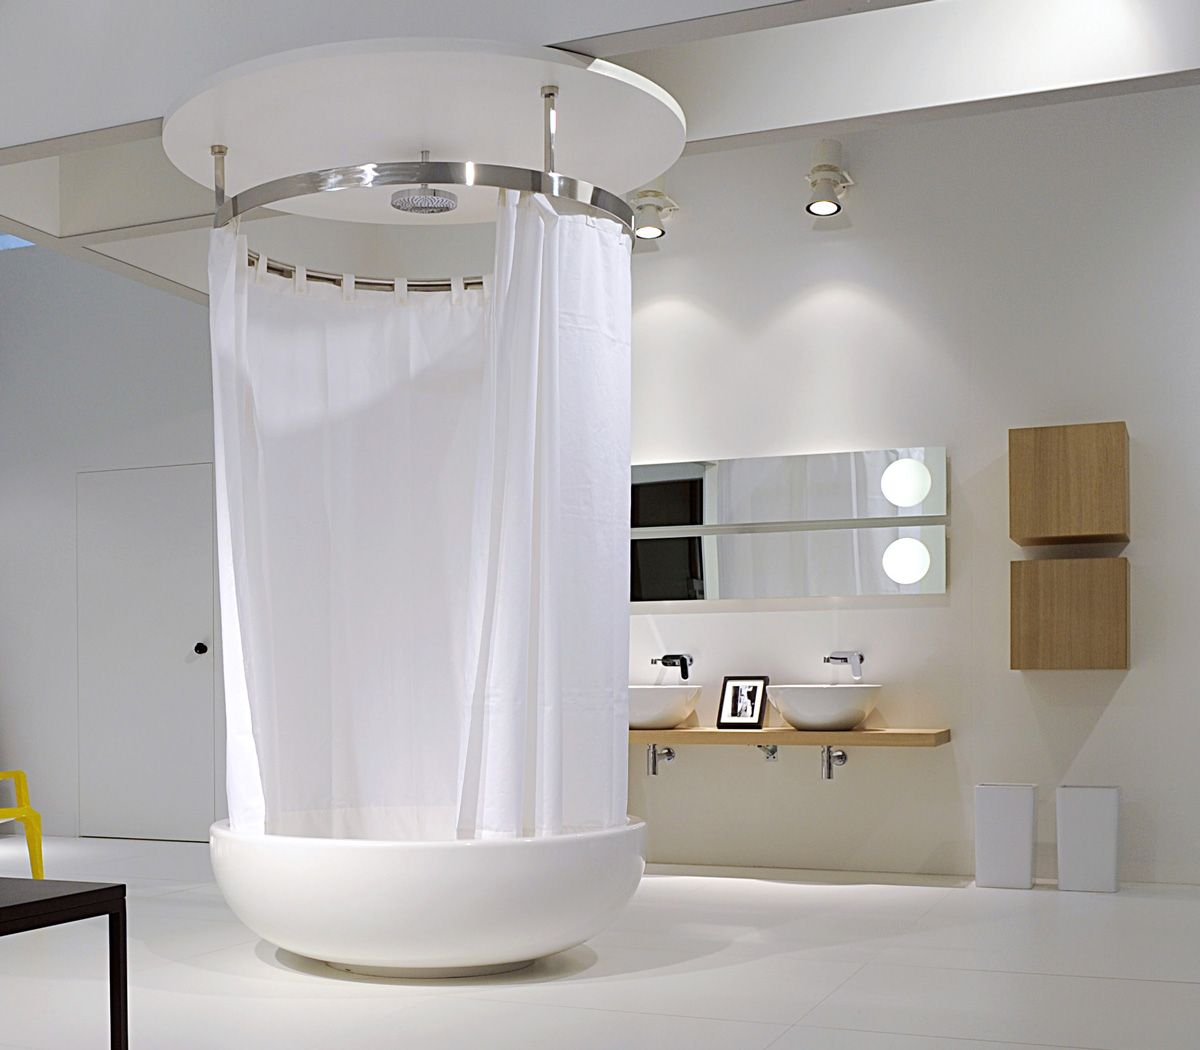 Brossette Salle De Bain Evreux ~ Fonte Fontana Flaminia Ceramic Sanitary Ware Faucets